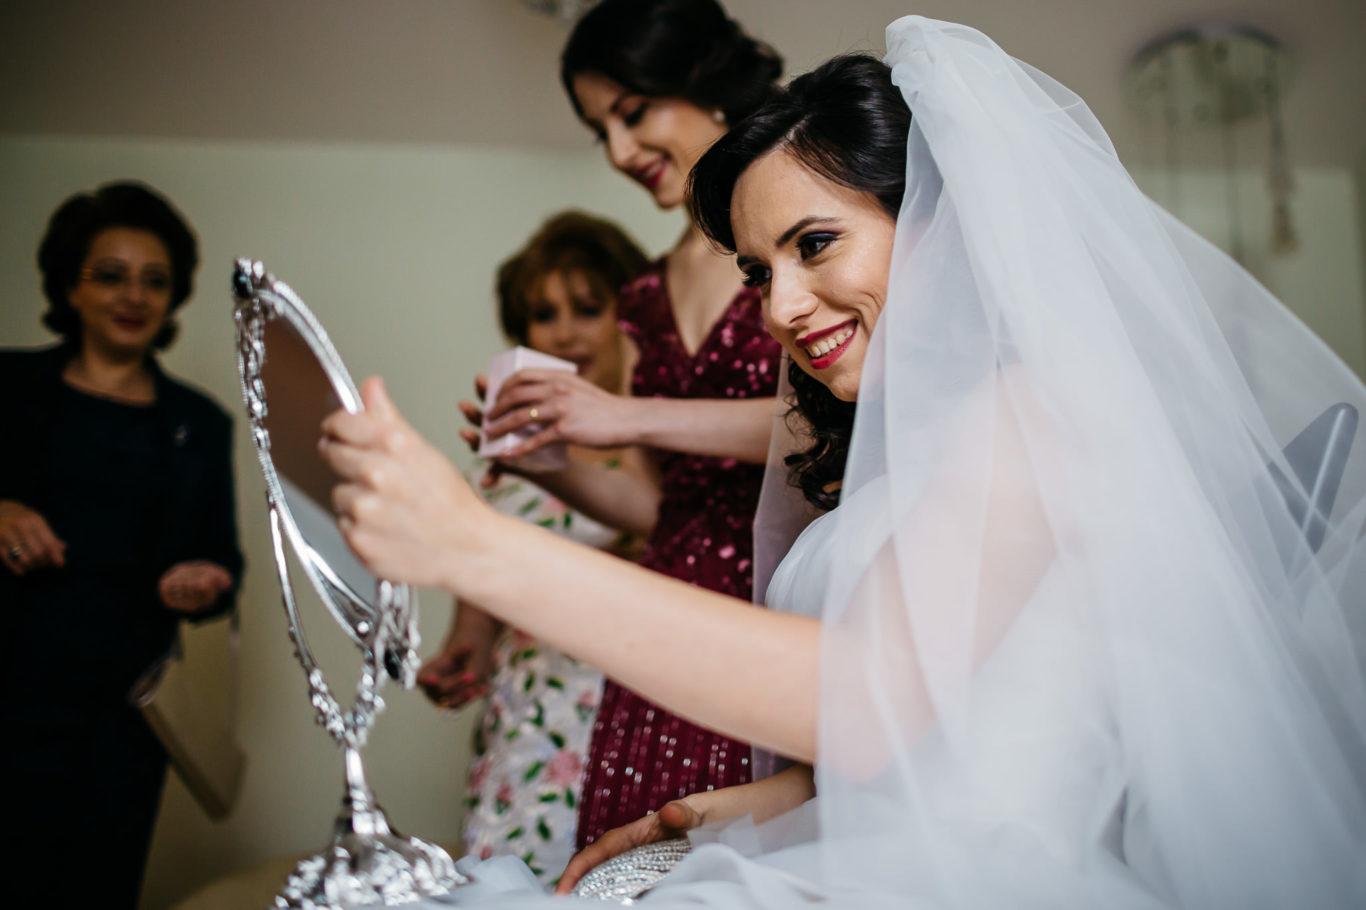 0254-Fotografie-nunta-Simona-Valentin-fotograf-Ciprian-Dumitrescu-CDF_8615